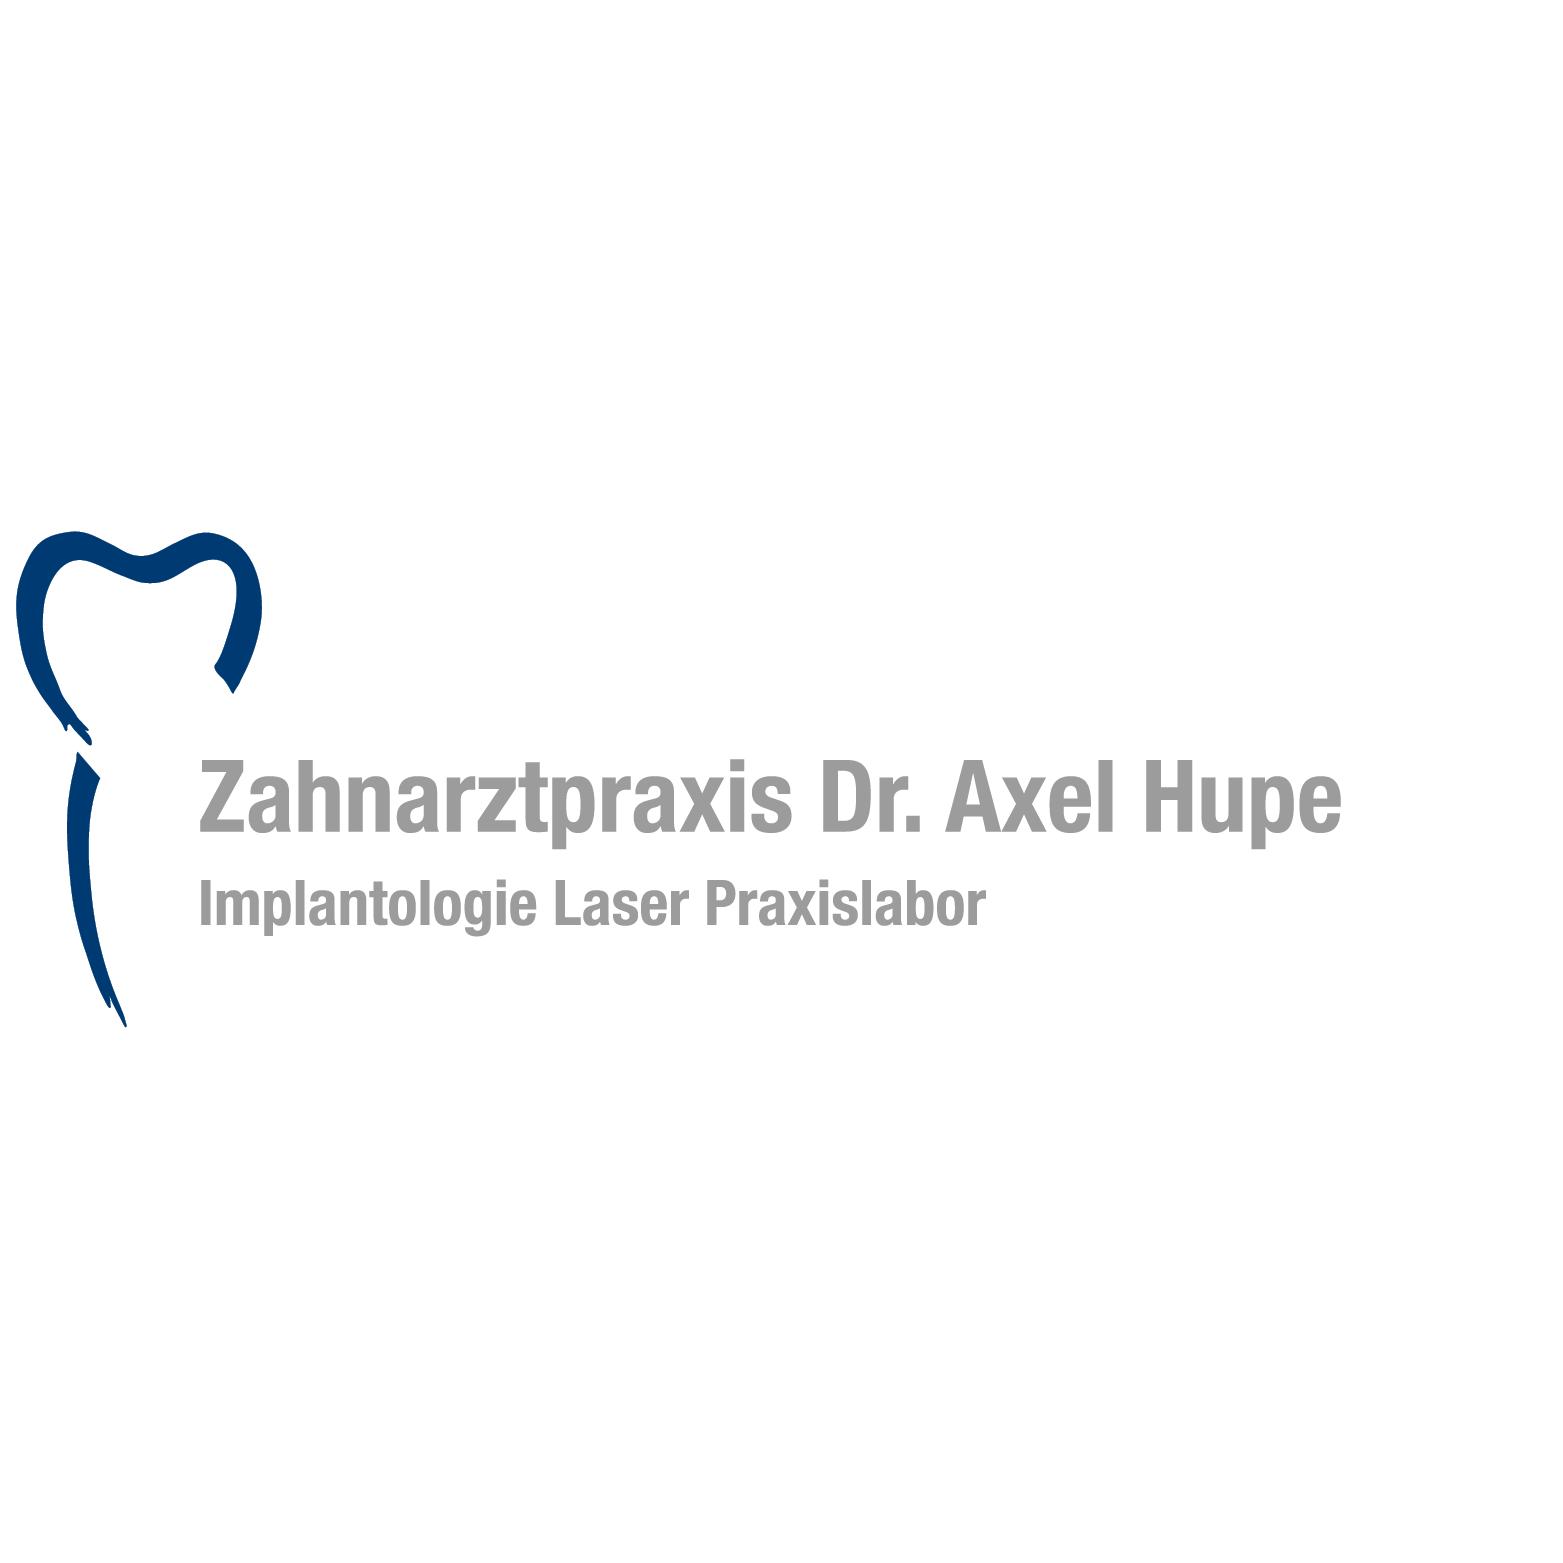 Logo von Zahnarztpraxis Dr. Axel Hupe in Hannover